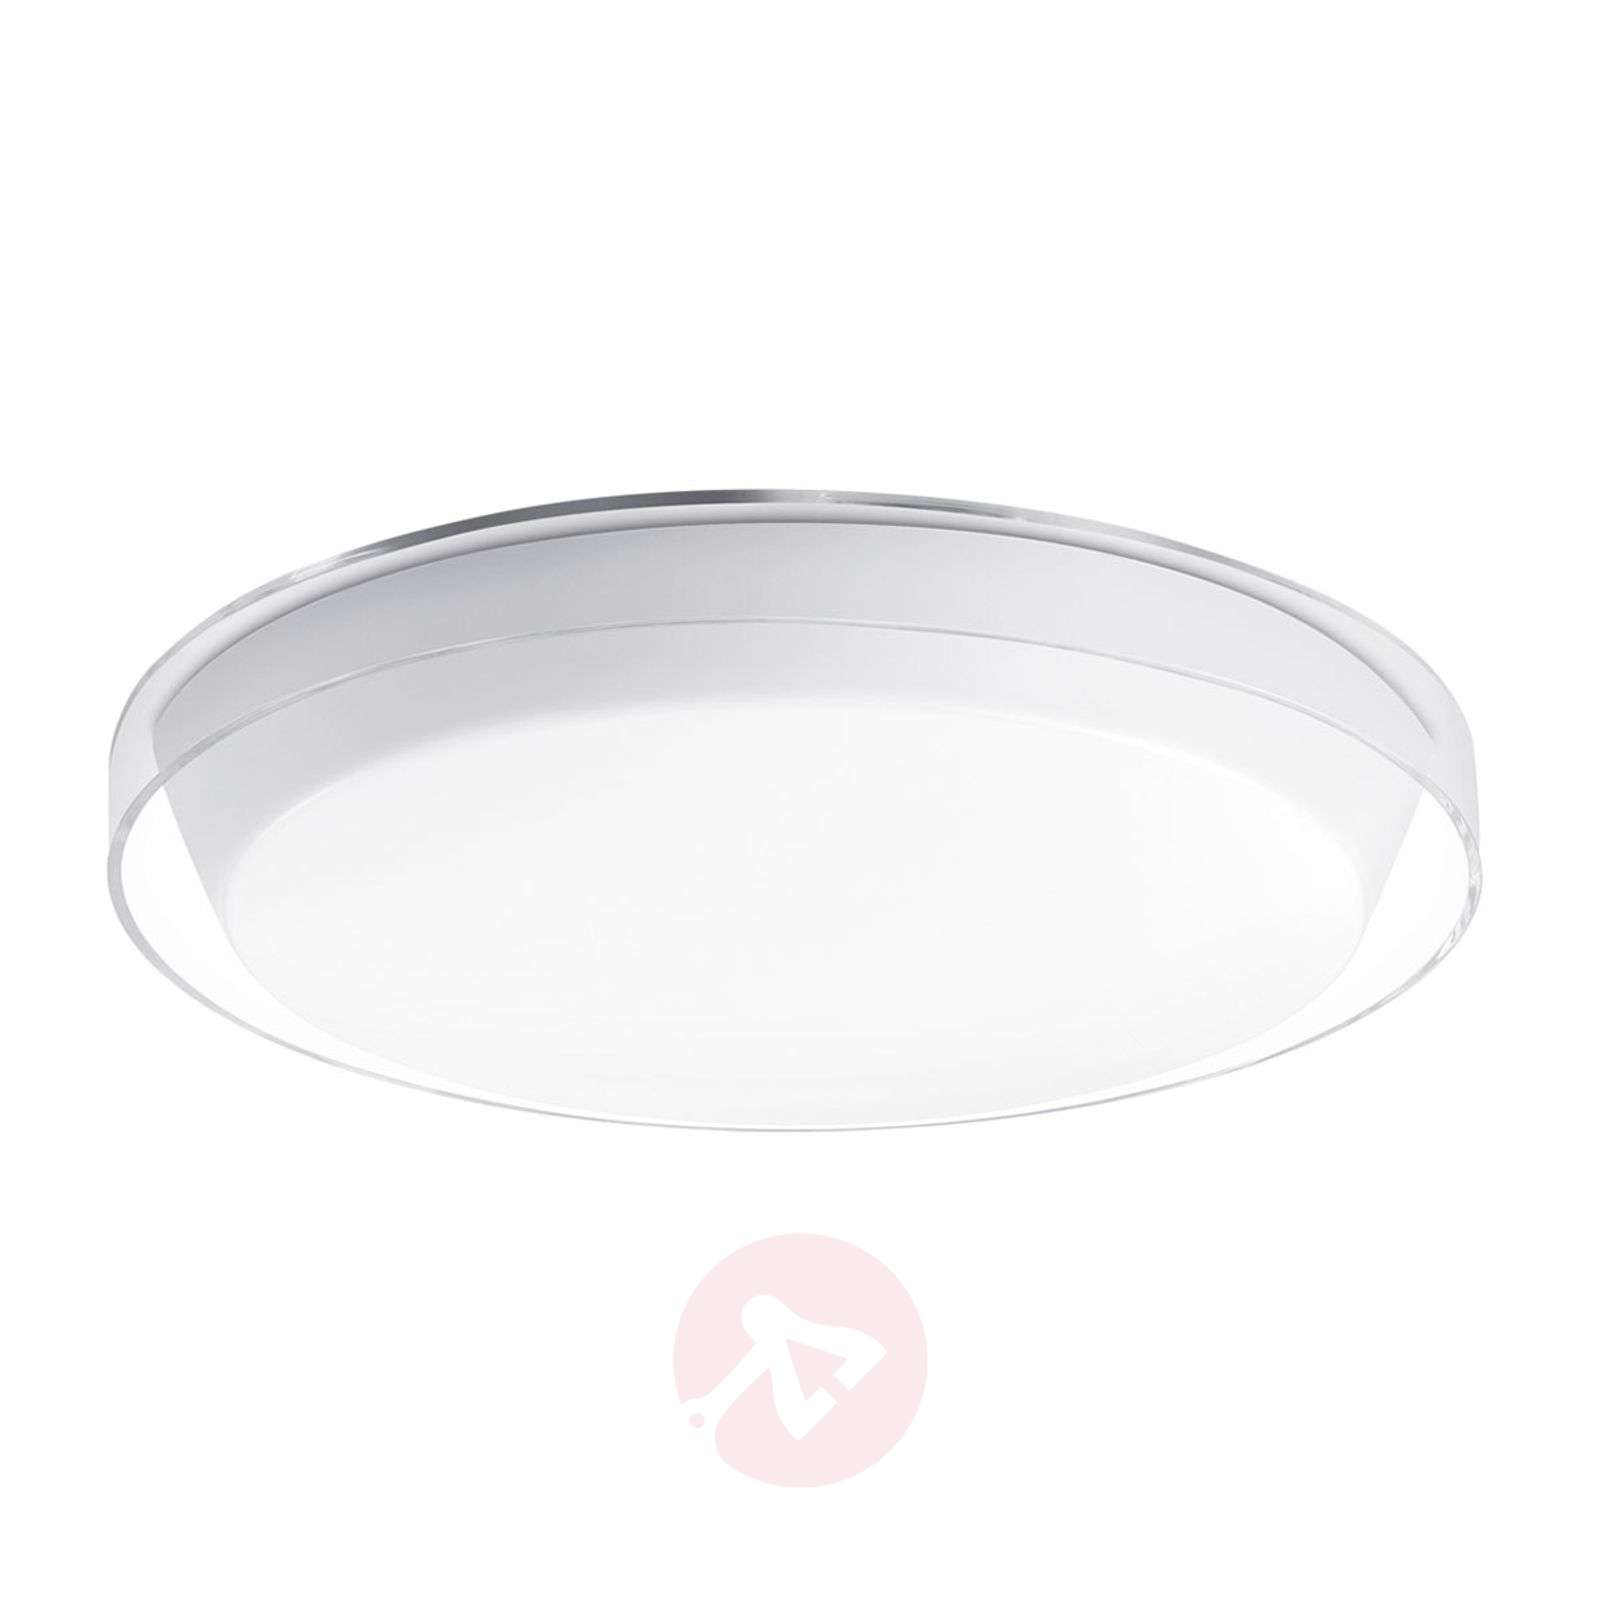 Round KL376 LED ceiling light made of plastic-8542057-01